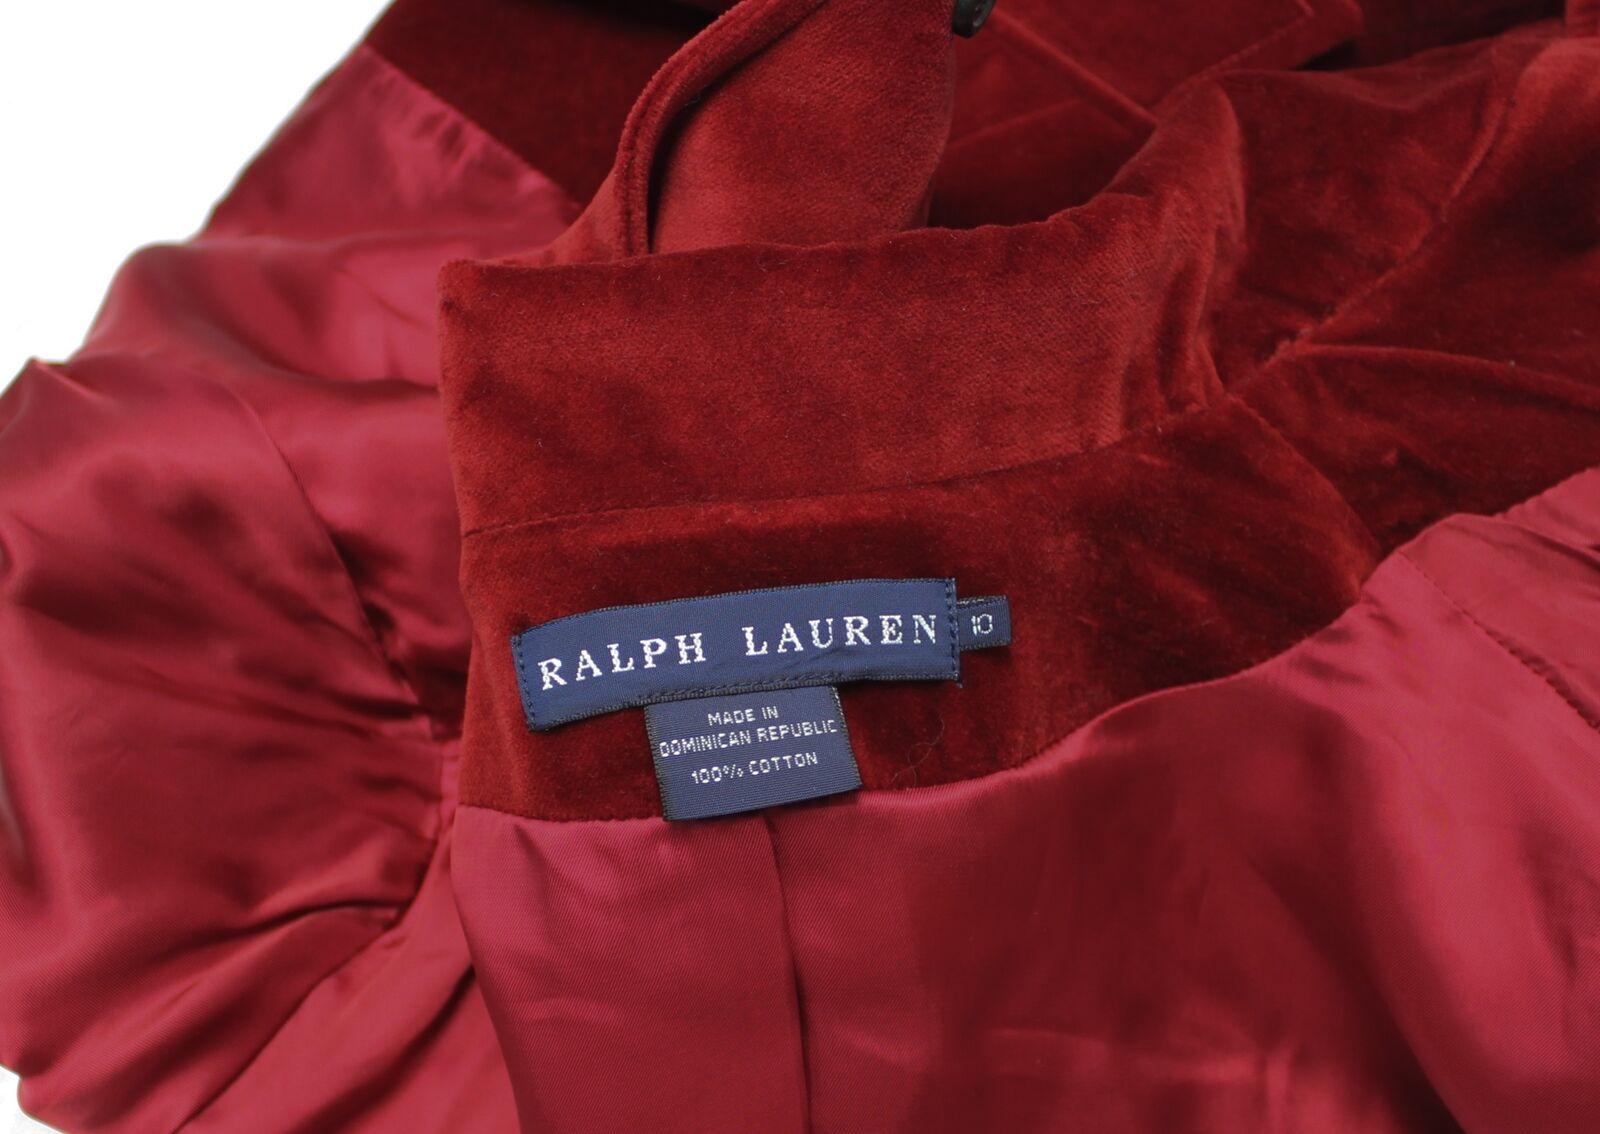 Ralph Lauren Red Velvet Blazer Jacket Size 10 - image 11